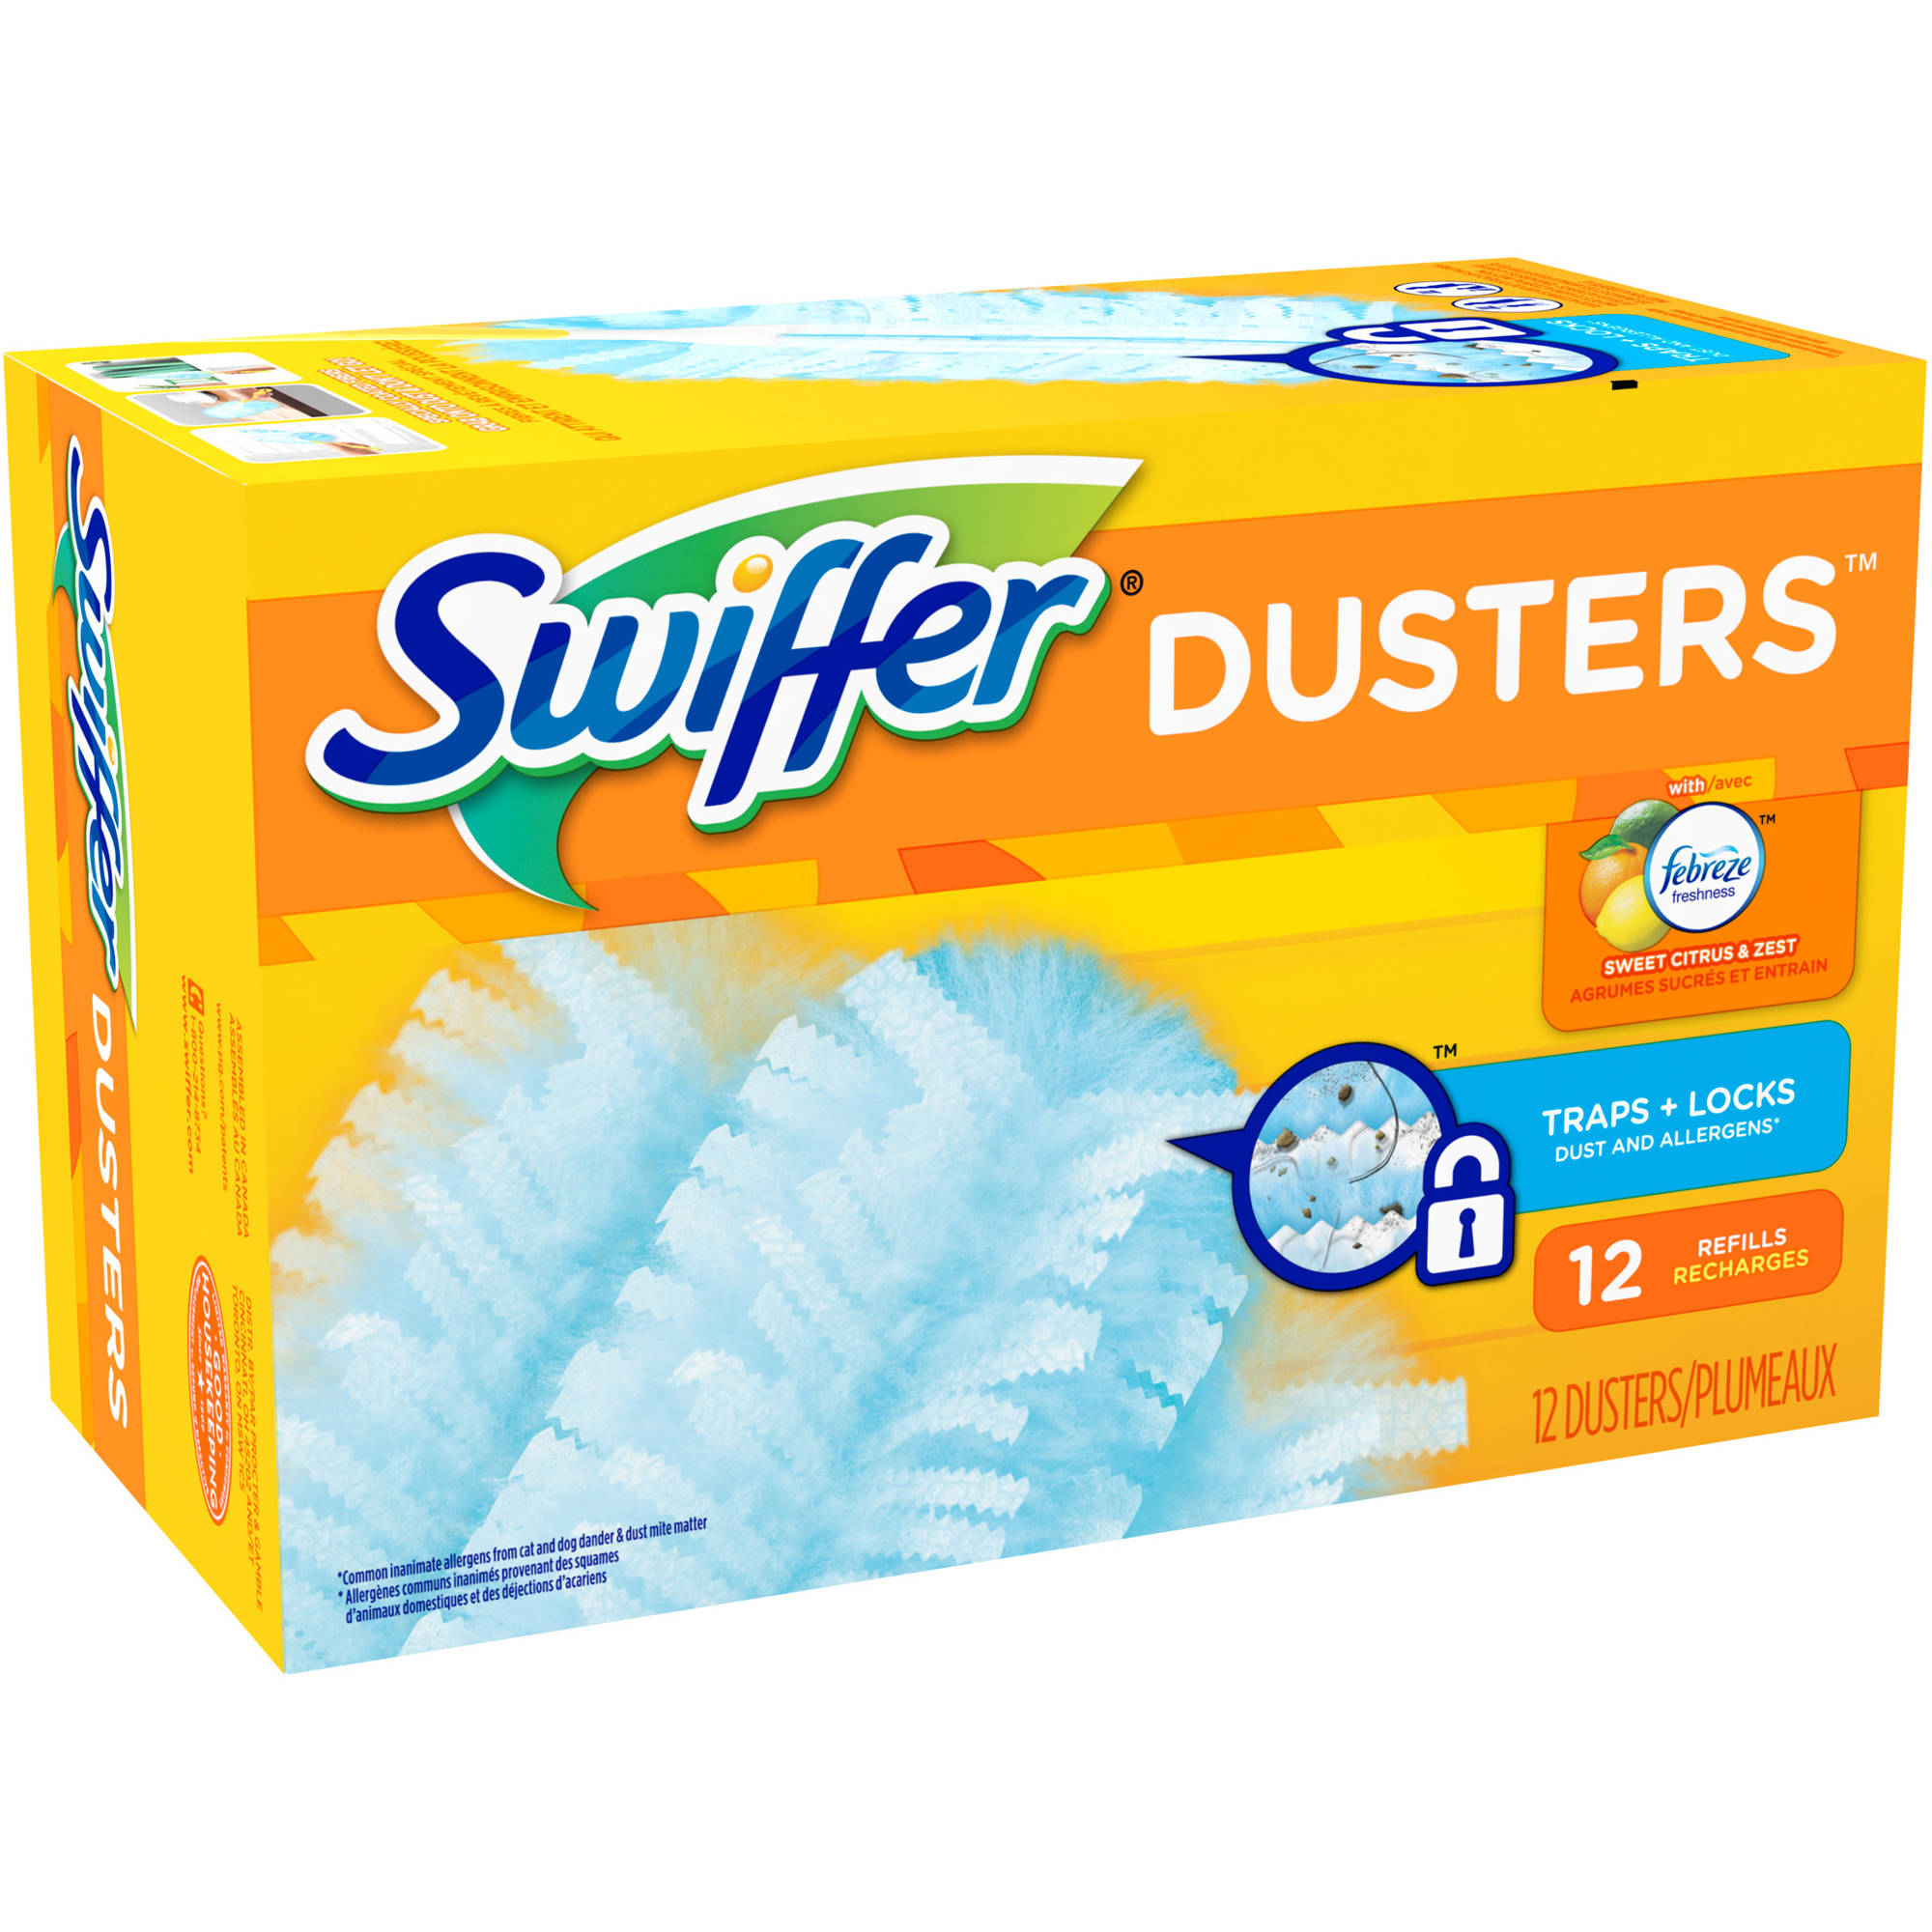 Swiffer Dusters Refills, Citrus & Zest (choose your size)